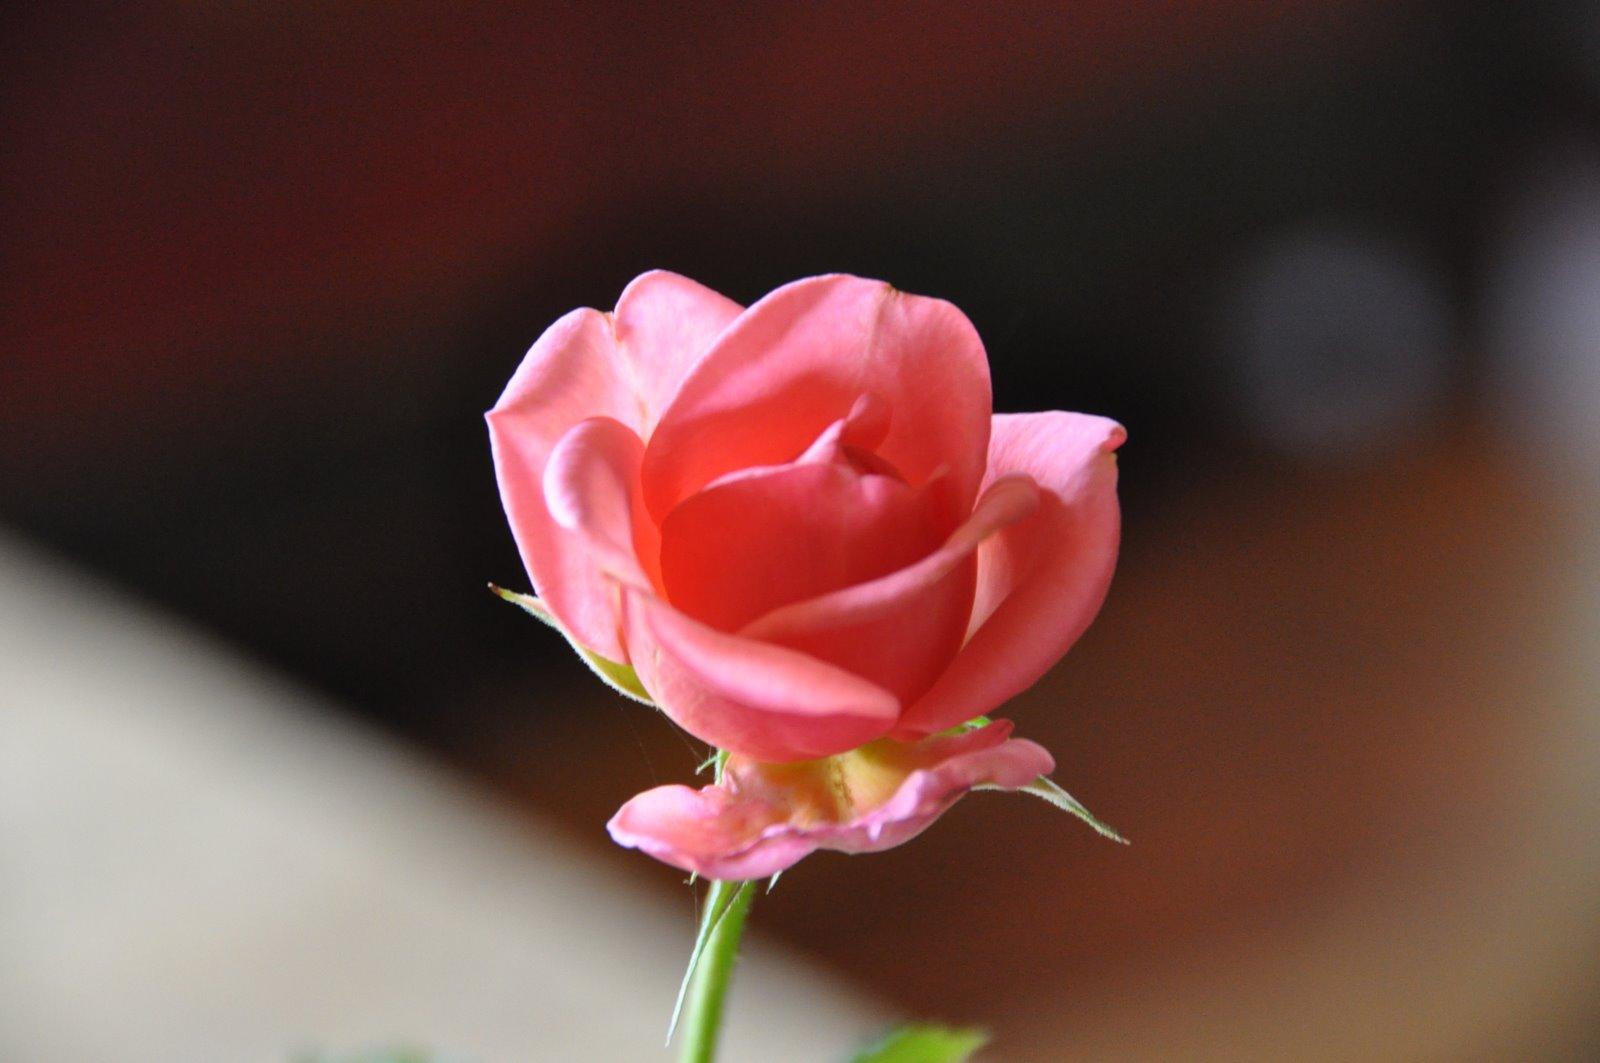 Joli Minois Et Jolie Fleur